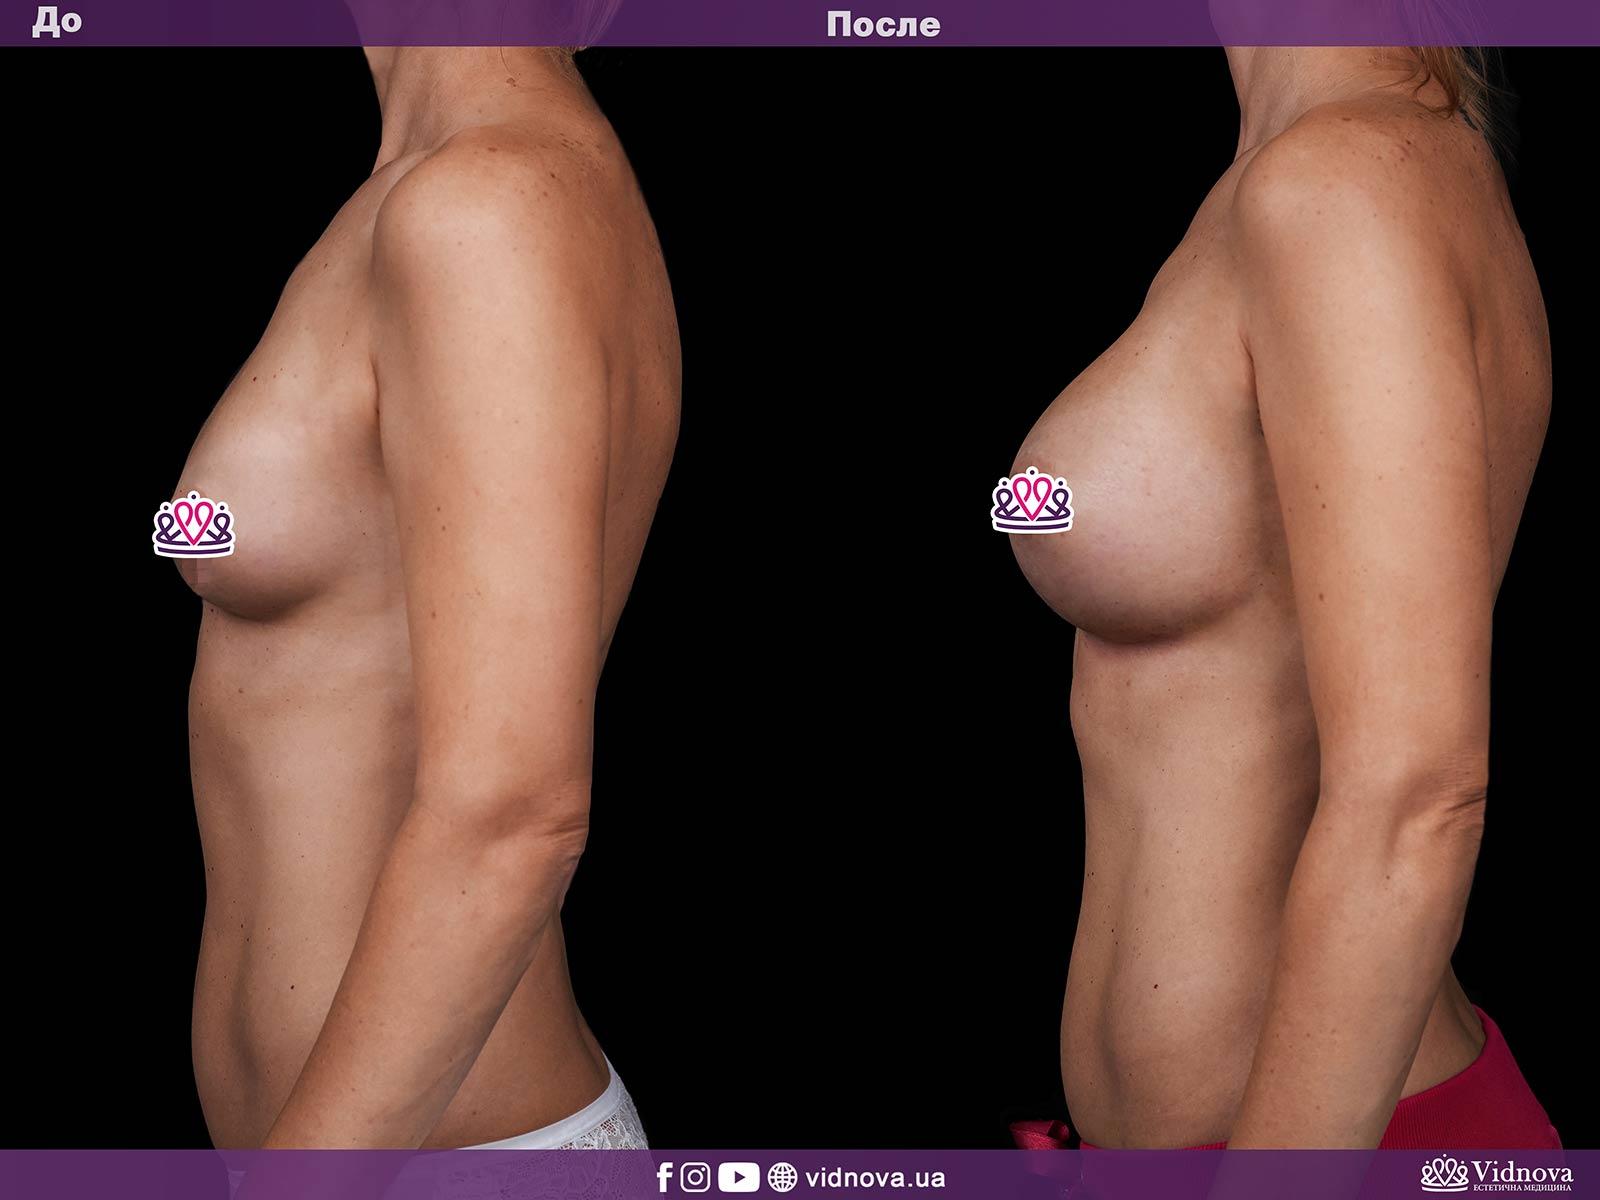 Увеличение груди: Фото ДО и ПОСЛЕ - Пример №20-3 - Клиника Vidnova